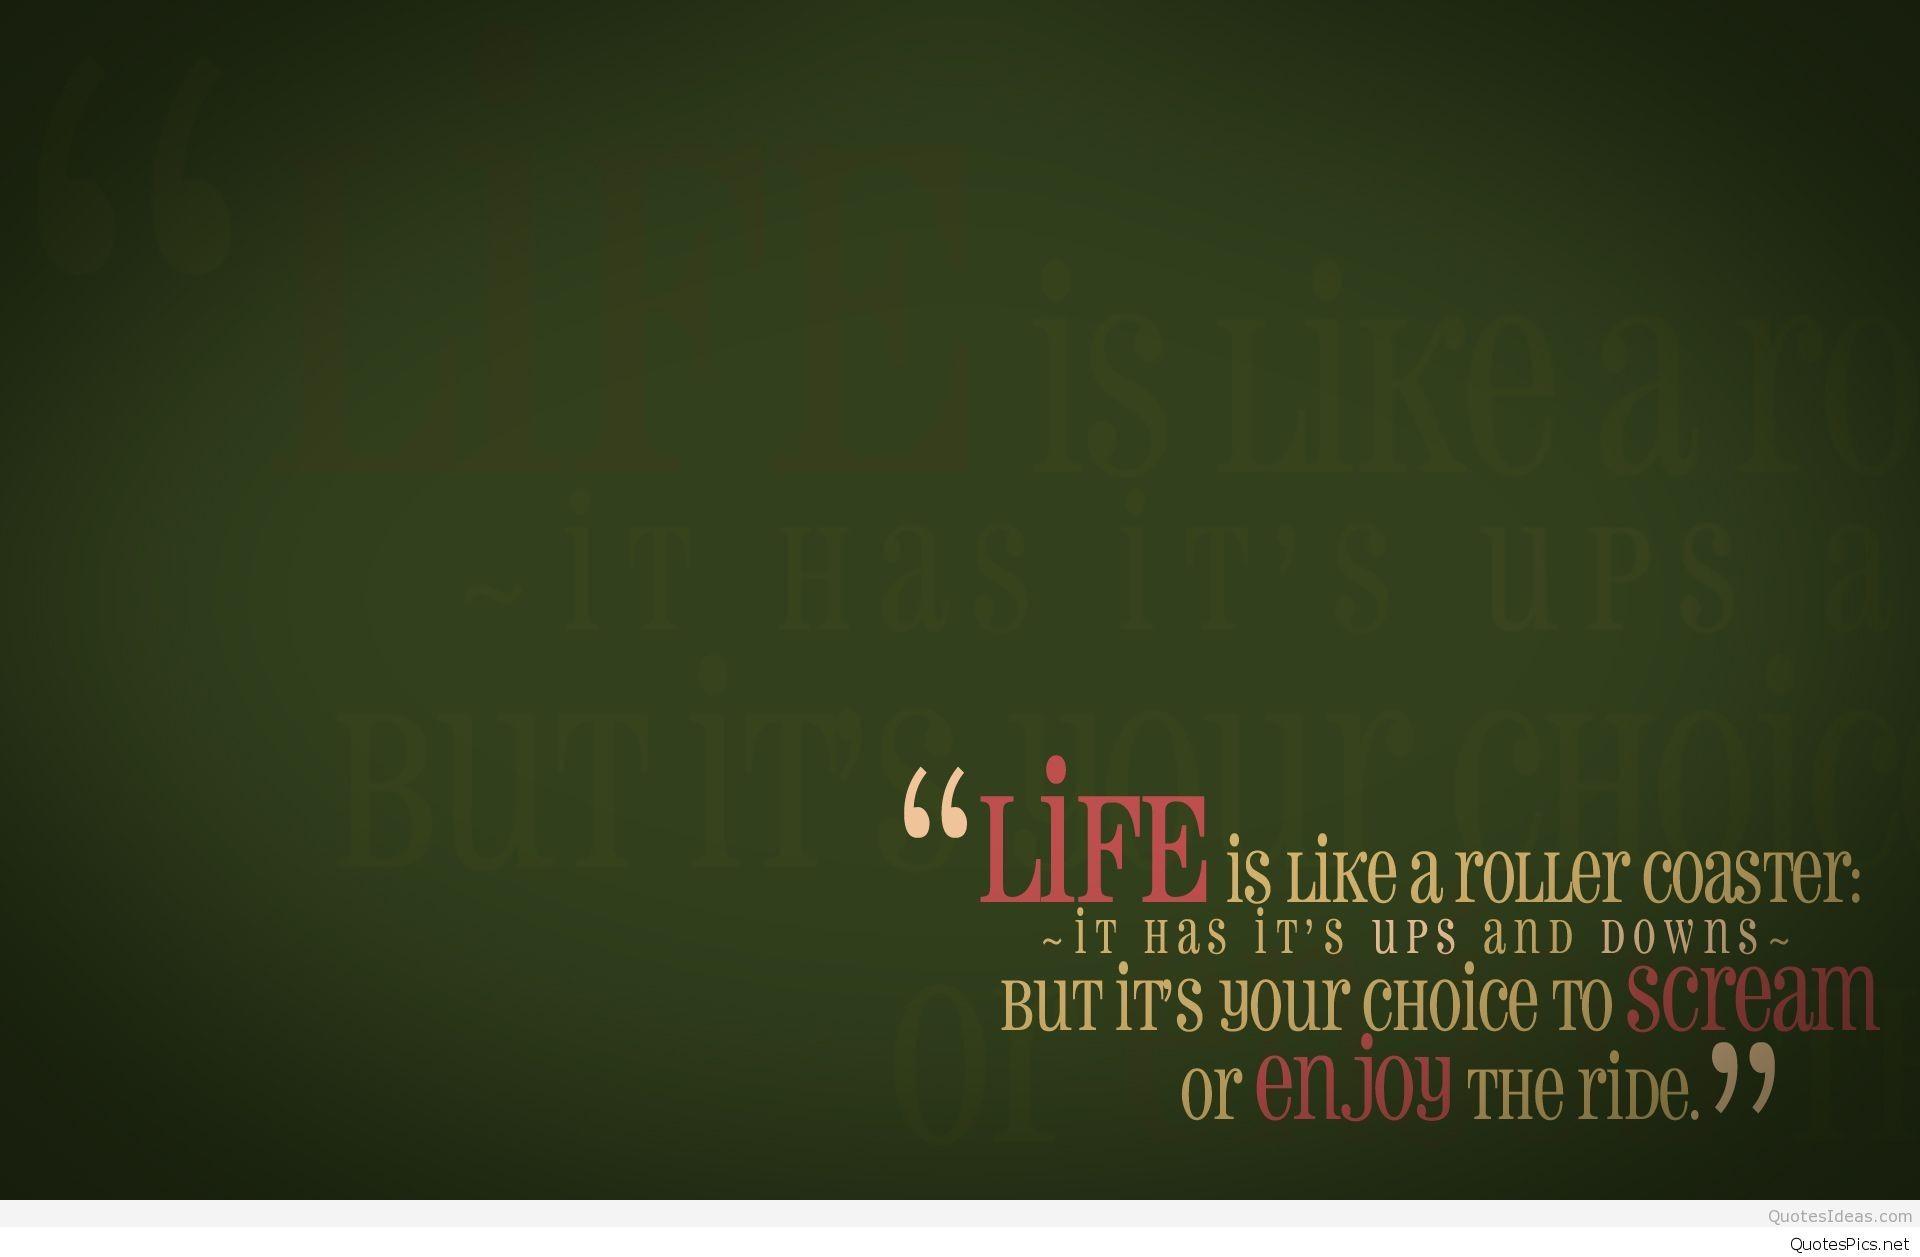 1920x1257, Inspirational Quote Wallpaper For Laptop - De Portada Para Facebook - HD Wallpaper